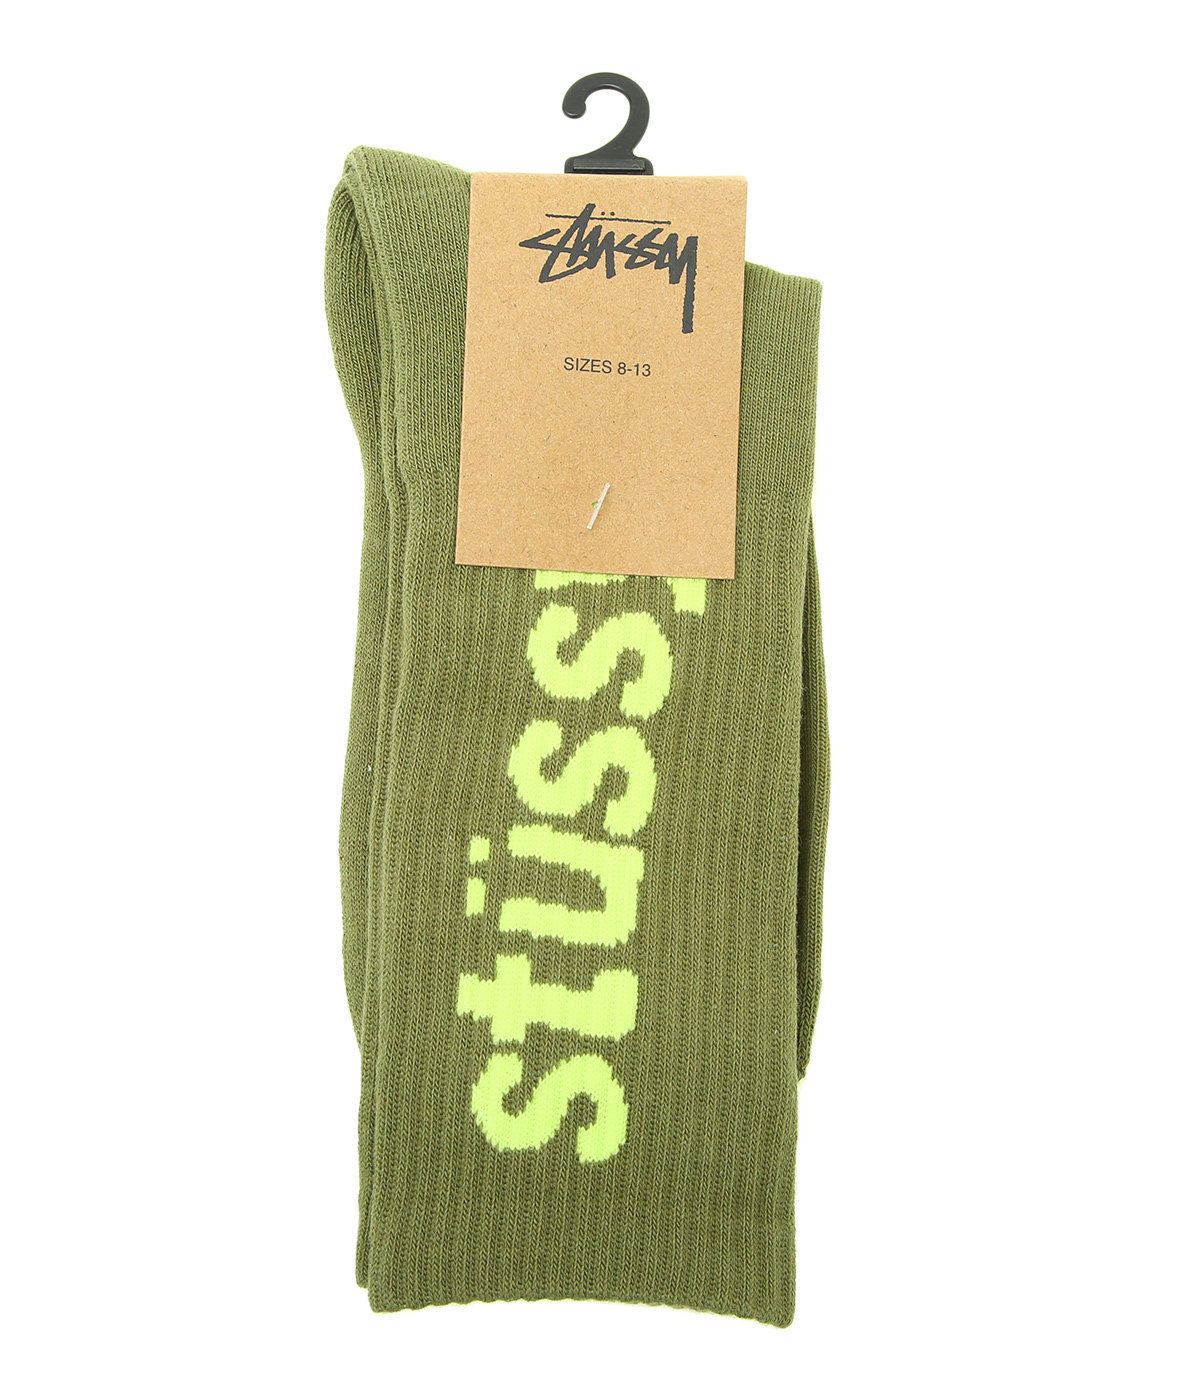 Helvetica Jacquard Crew Socks